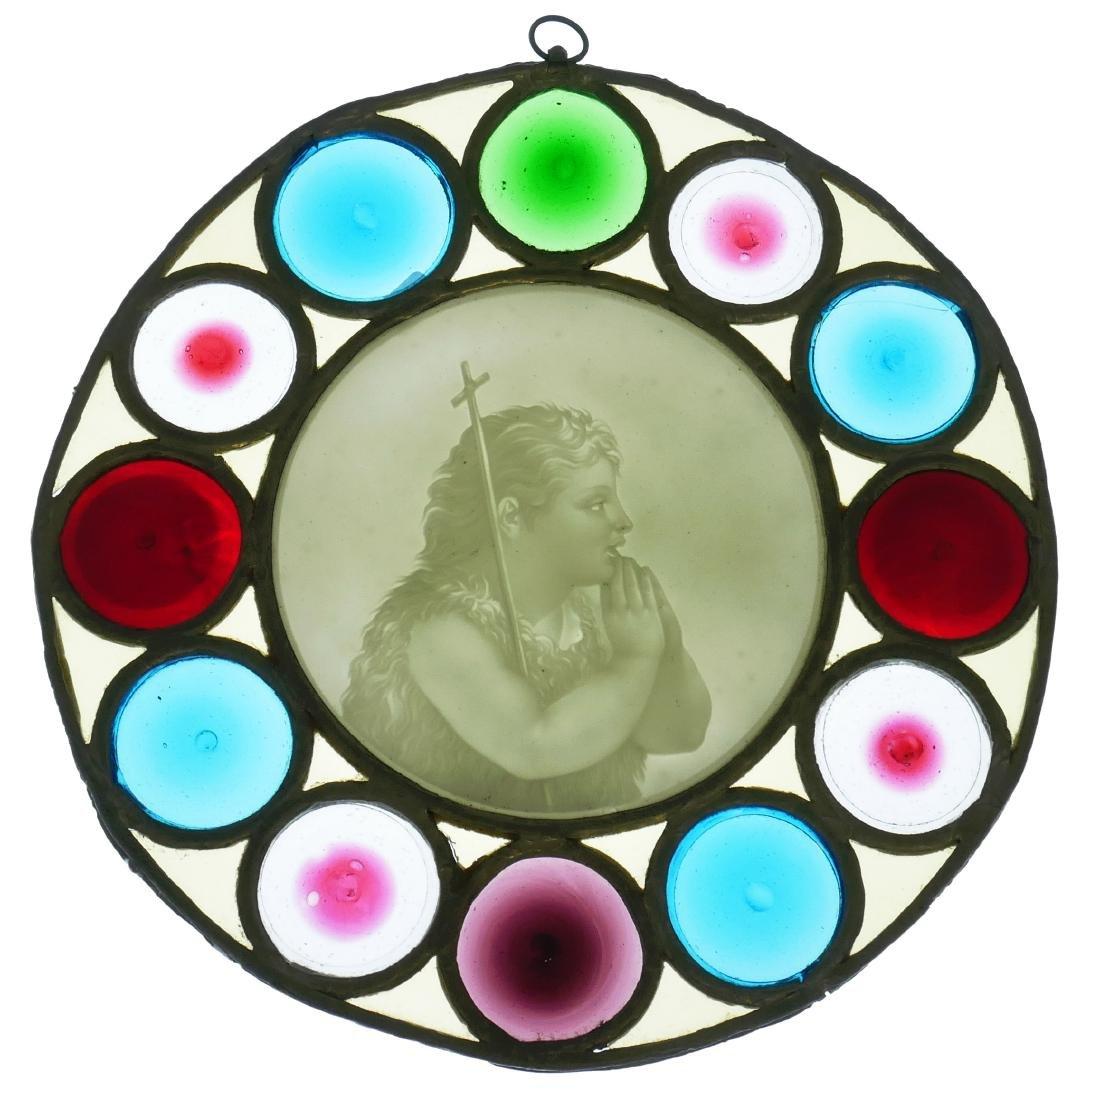 KPM Porcelain Lithophane Panel of Jesus